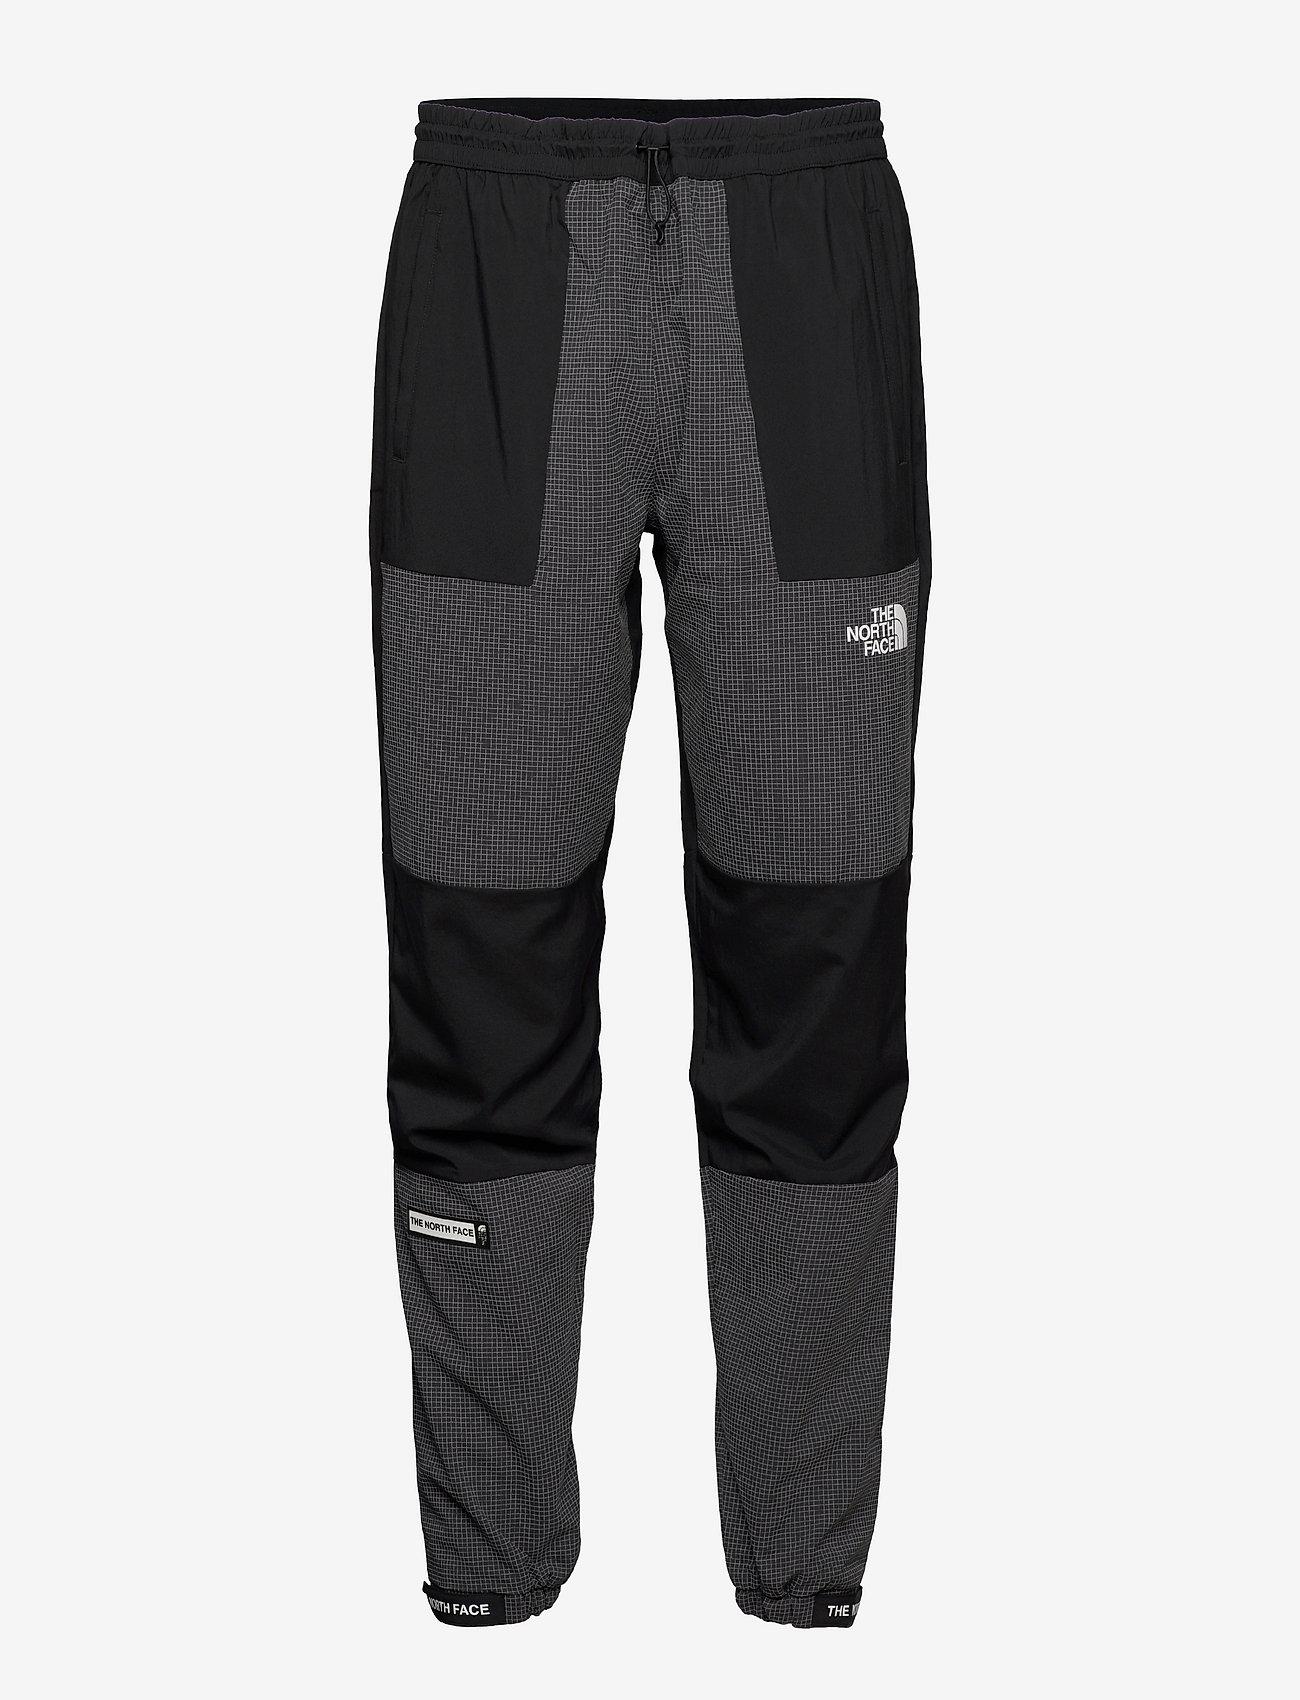 The North Face - M MA WOVEN PANT - EU - pantalon de randonnée - tnf black - 0